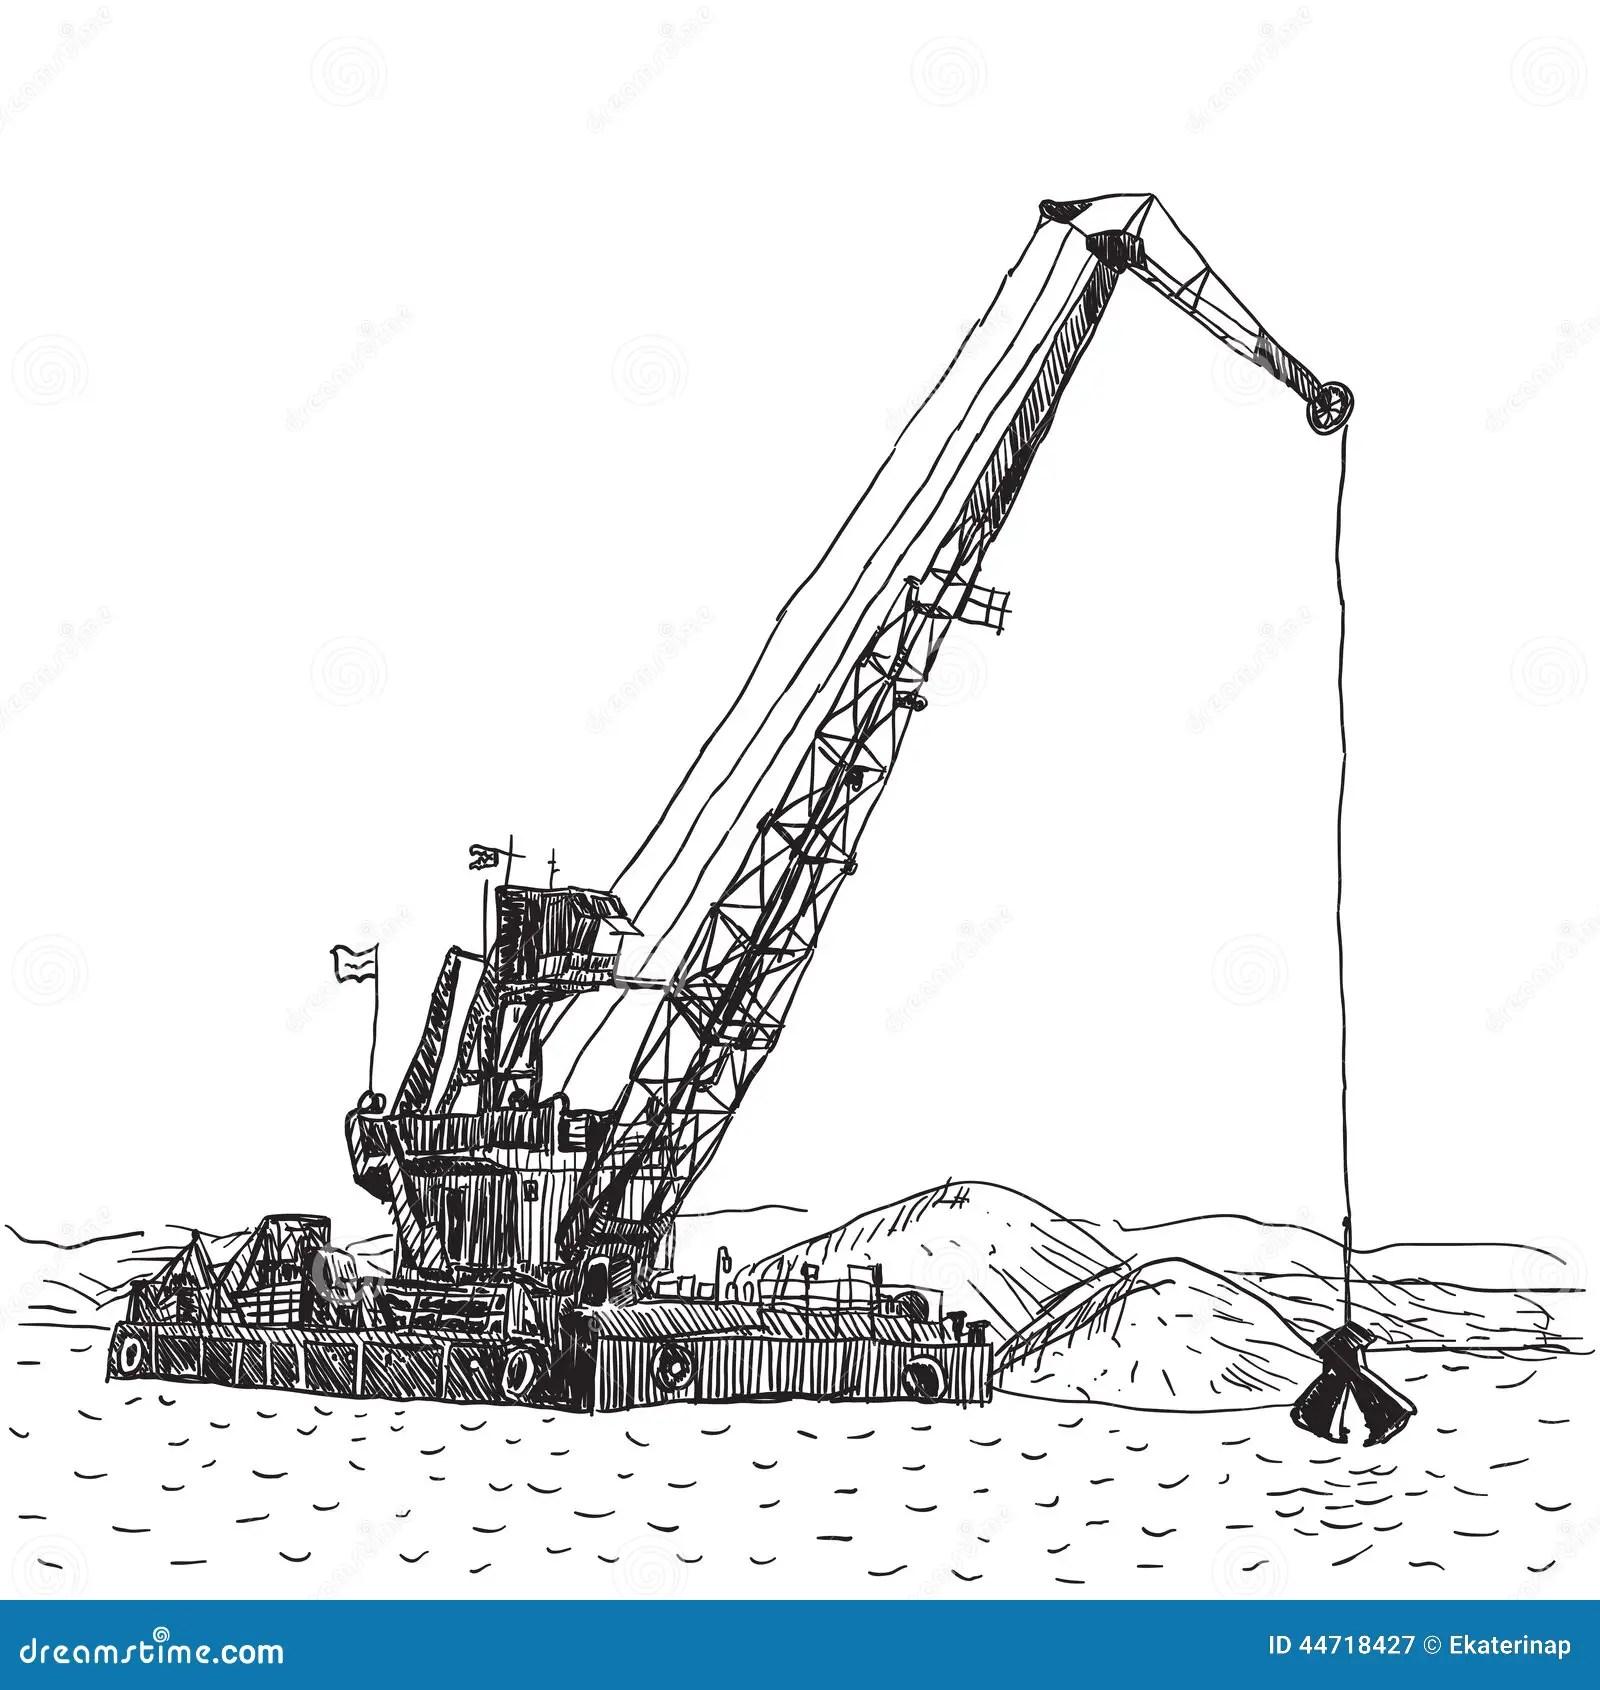 Huge Crane Barge Industrial Ship That Digs Sand Marine